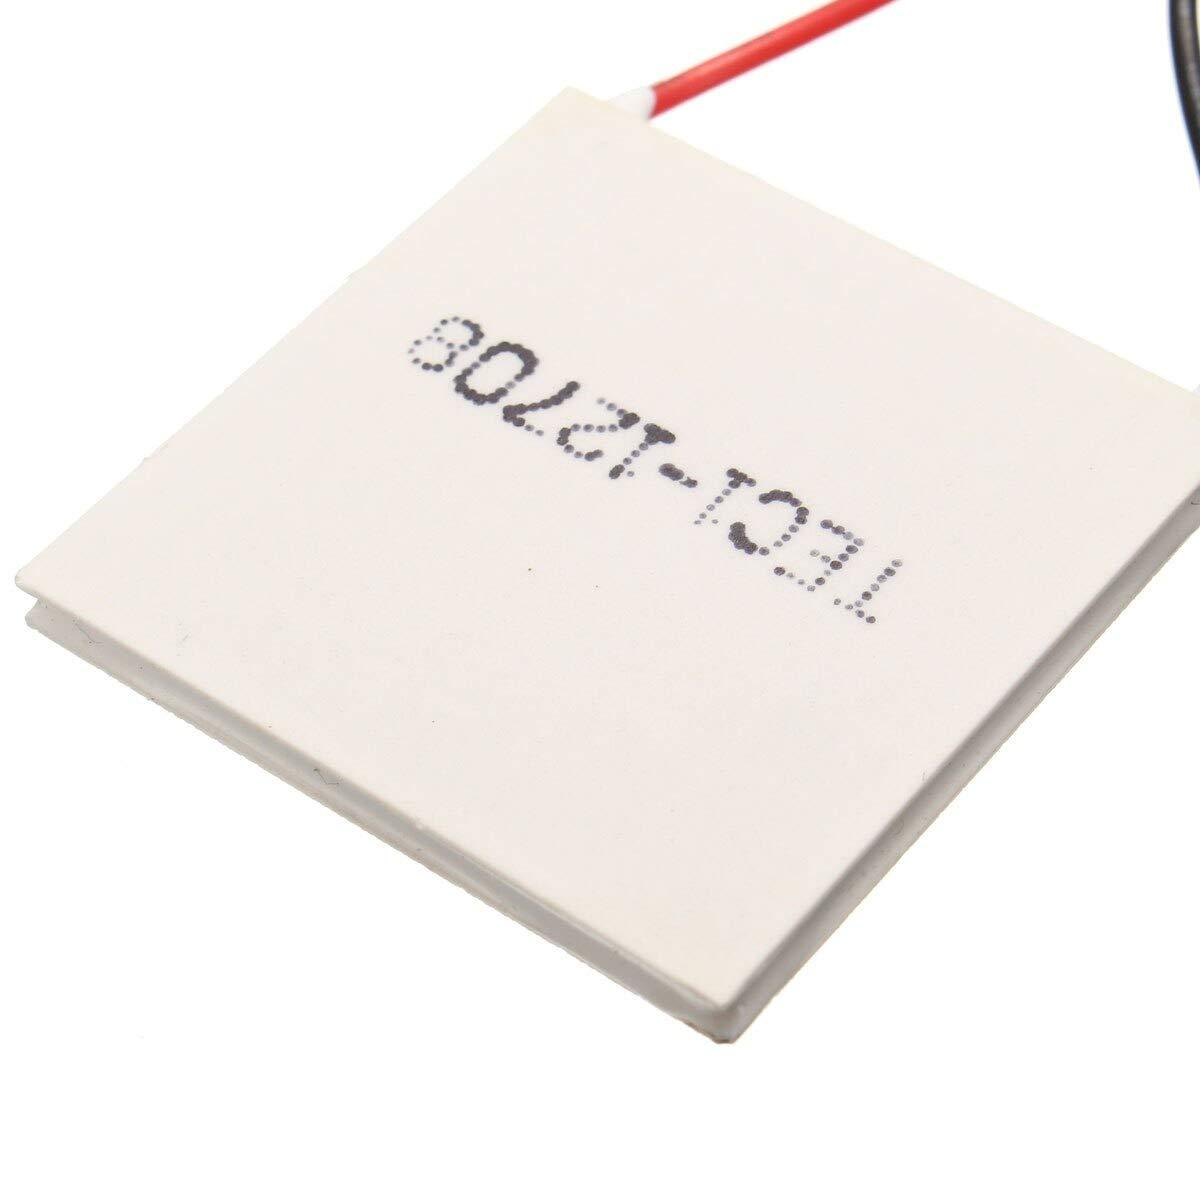 3pcs TEC1-12708 Heatsink Thermoelectric Cooler Cooling Peltier Plate Module